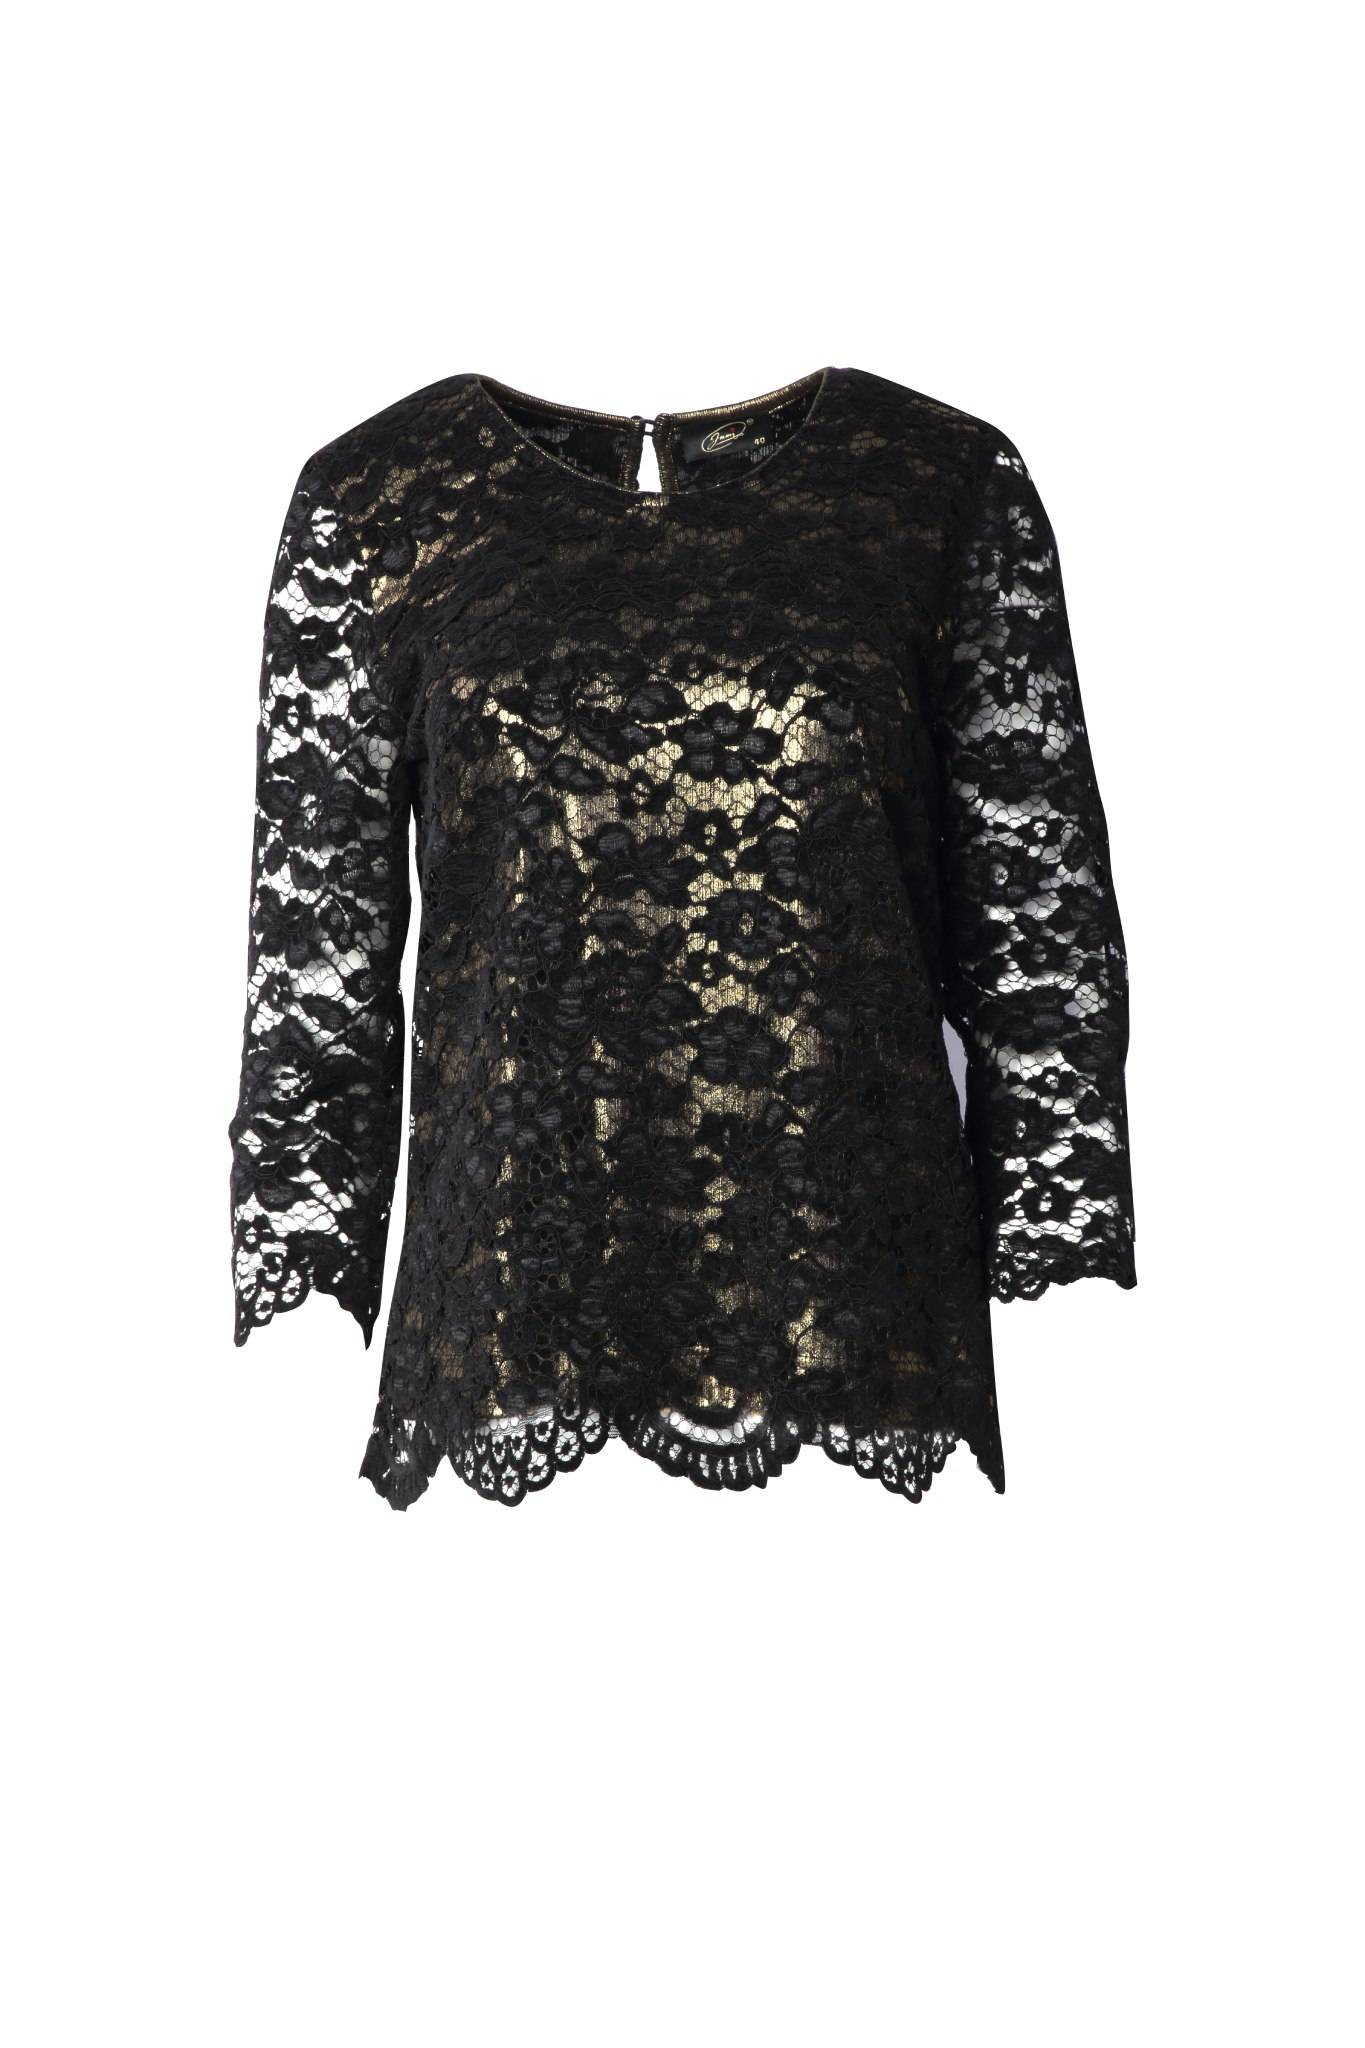 1239 Jumitex koronkowa bluzka czarna przod